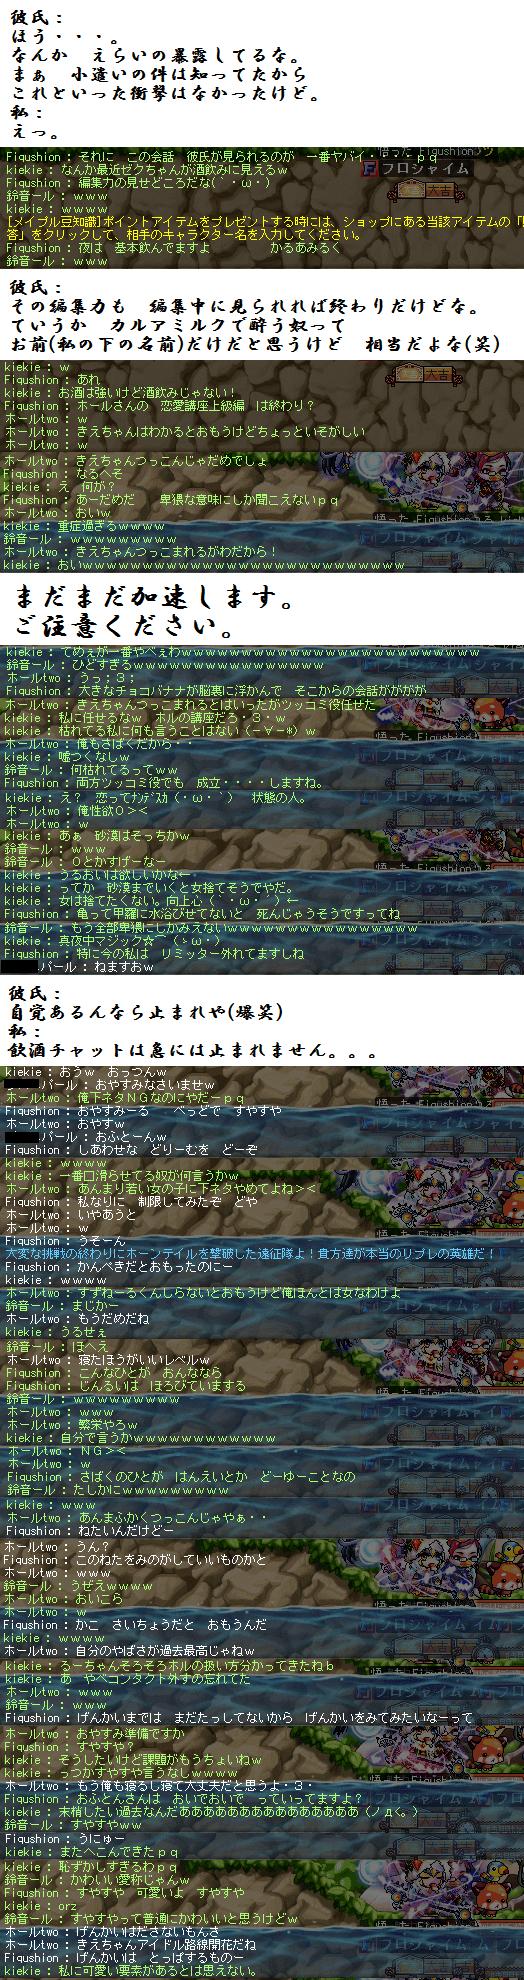 2013_0415_0035 _5